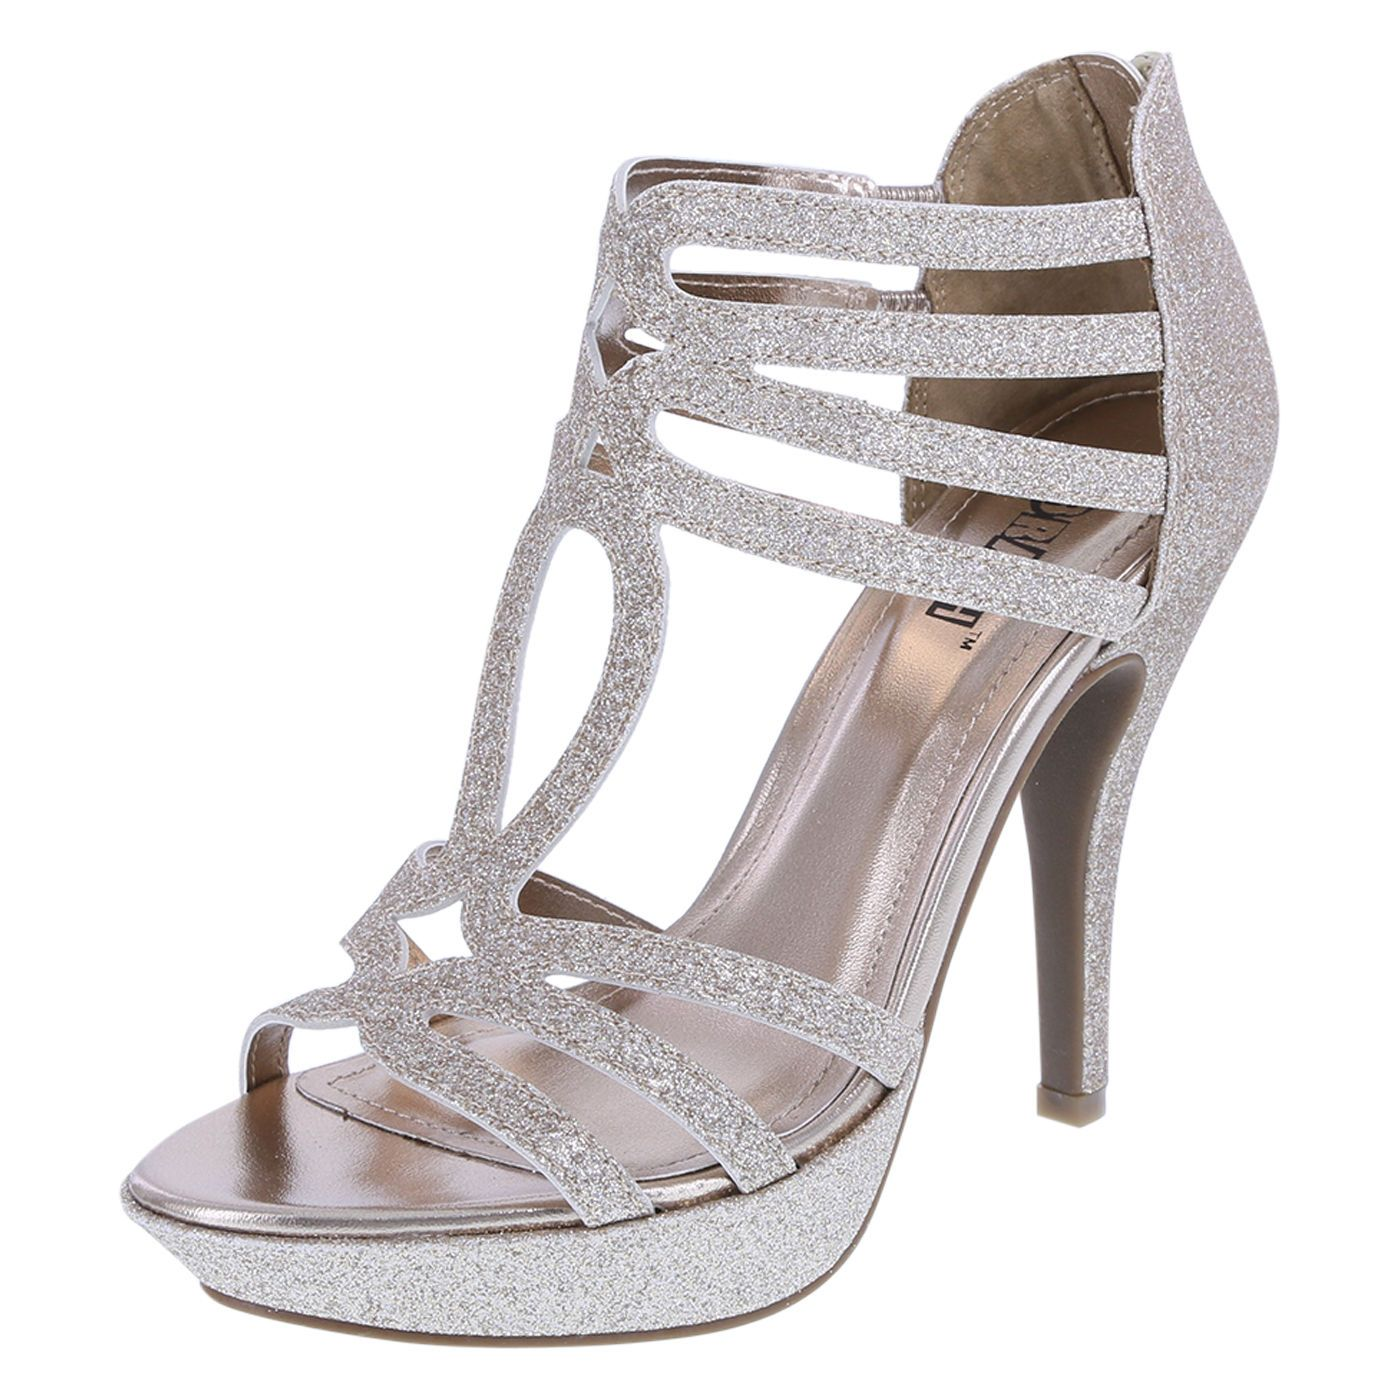 1a2eea4f3c4 Brash Women s SHOES Platform Heel Champagne Silver  Bridal Formal Wedding